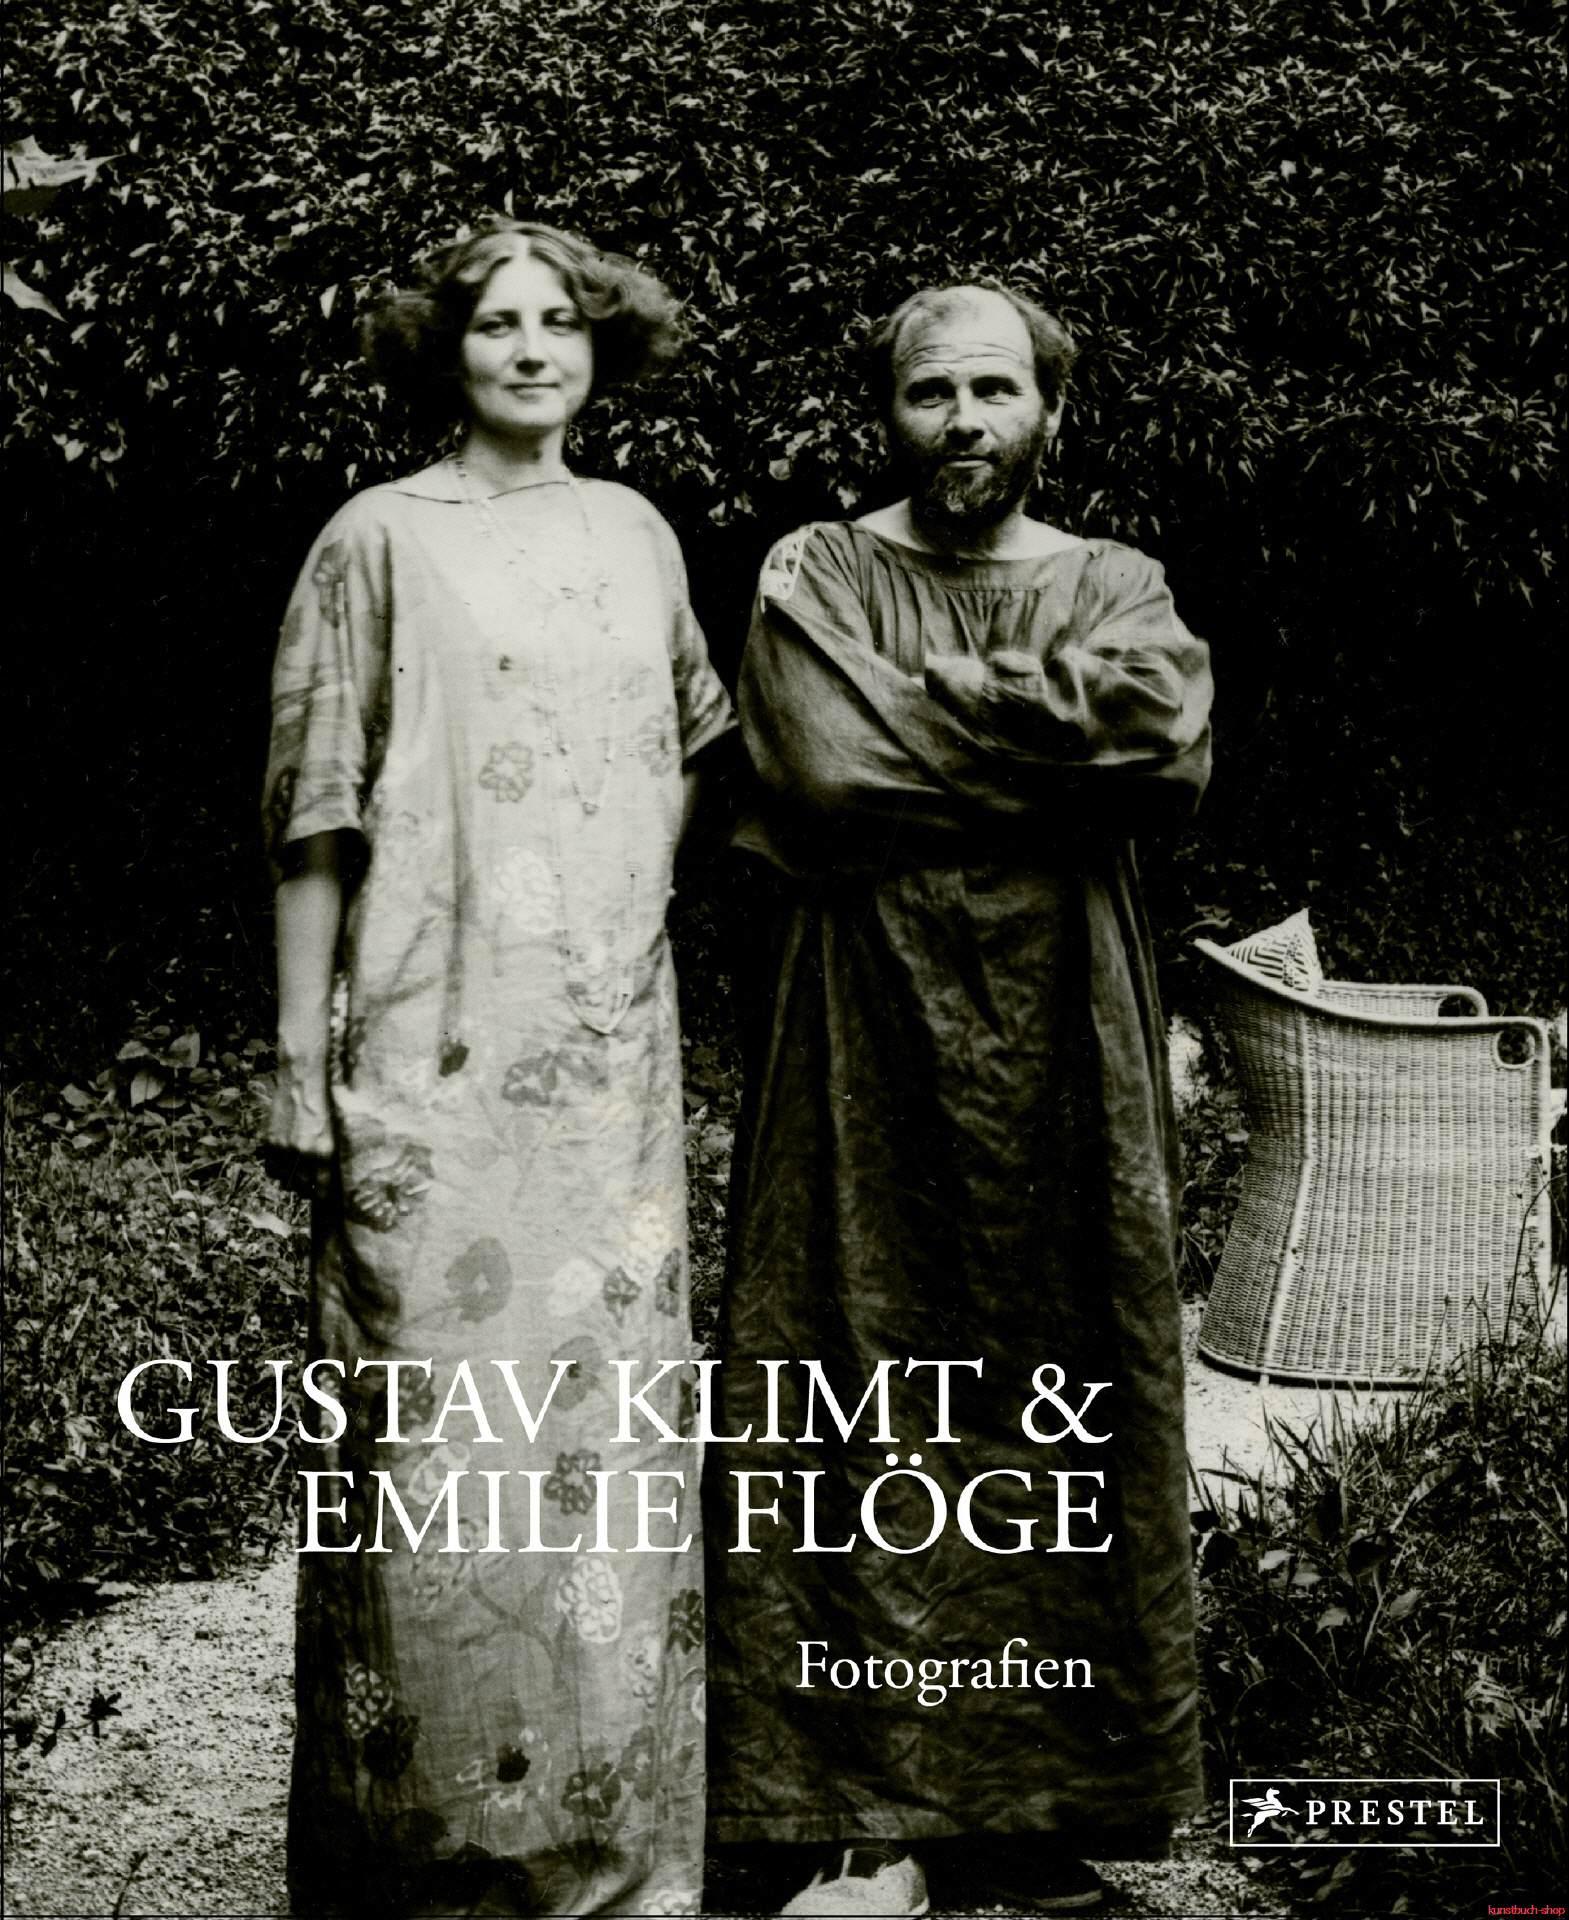 Gustav Klimt & Emilie Flöge  Fotografien - Agnes Husslein-Arco, Alfred Weidinger